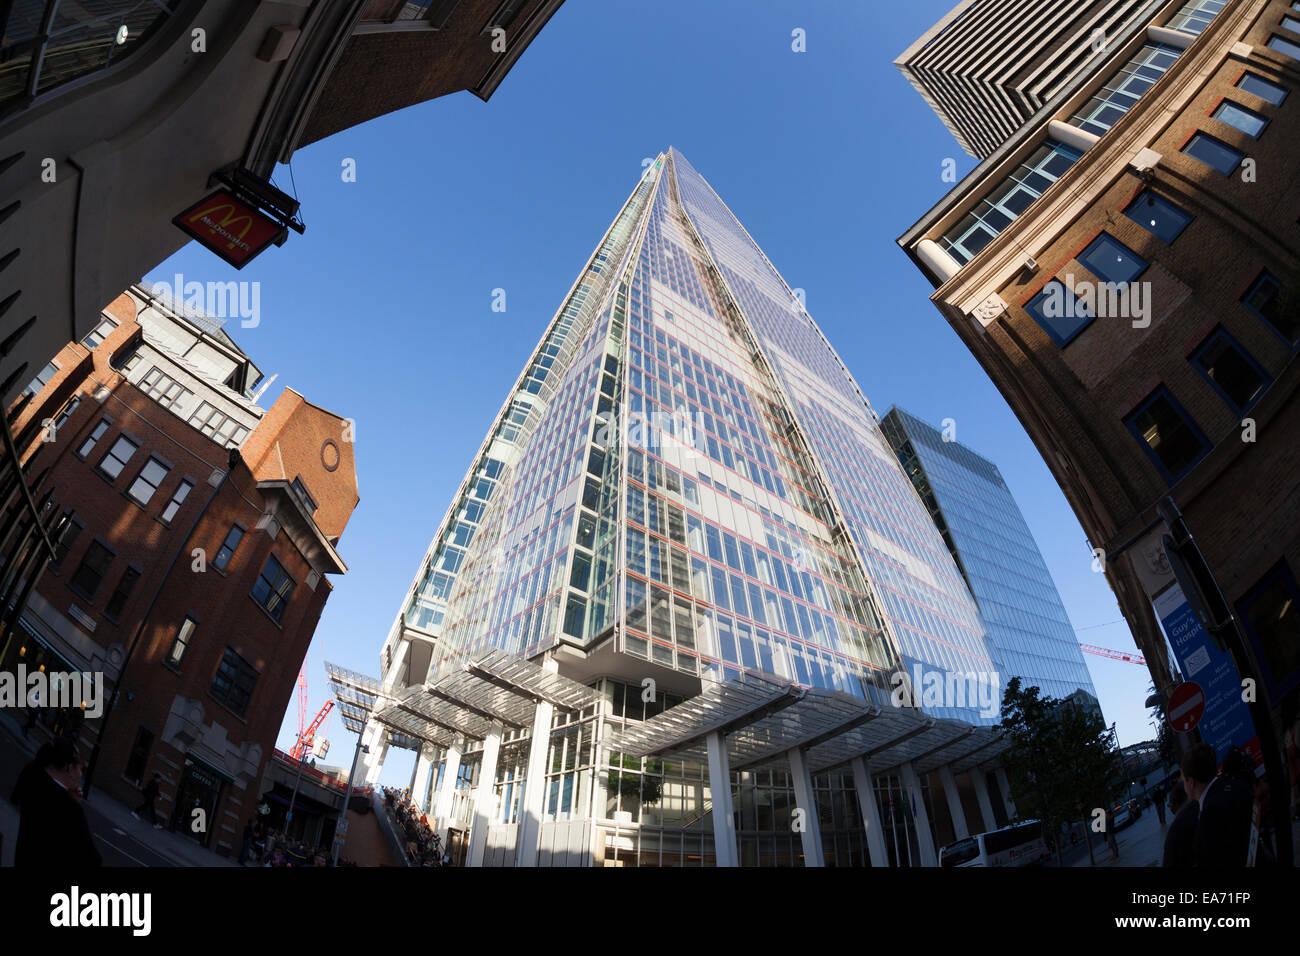 the-shard-southwark-london-EA71FP.jpg